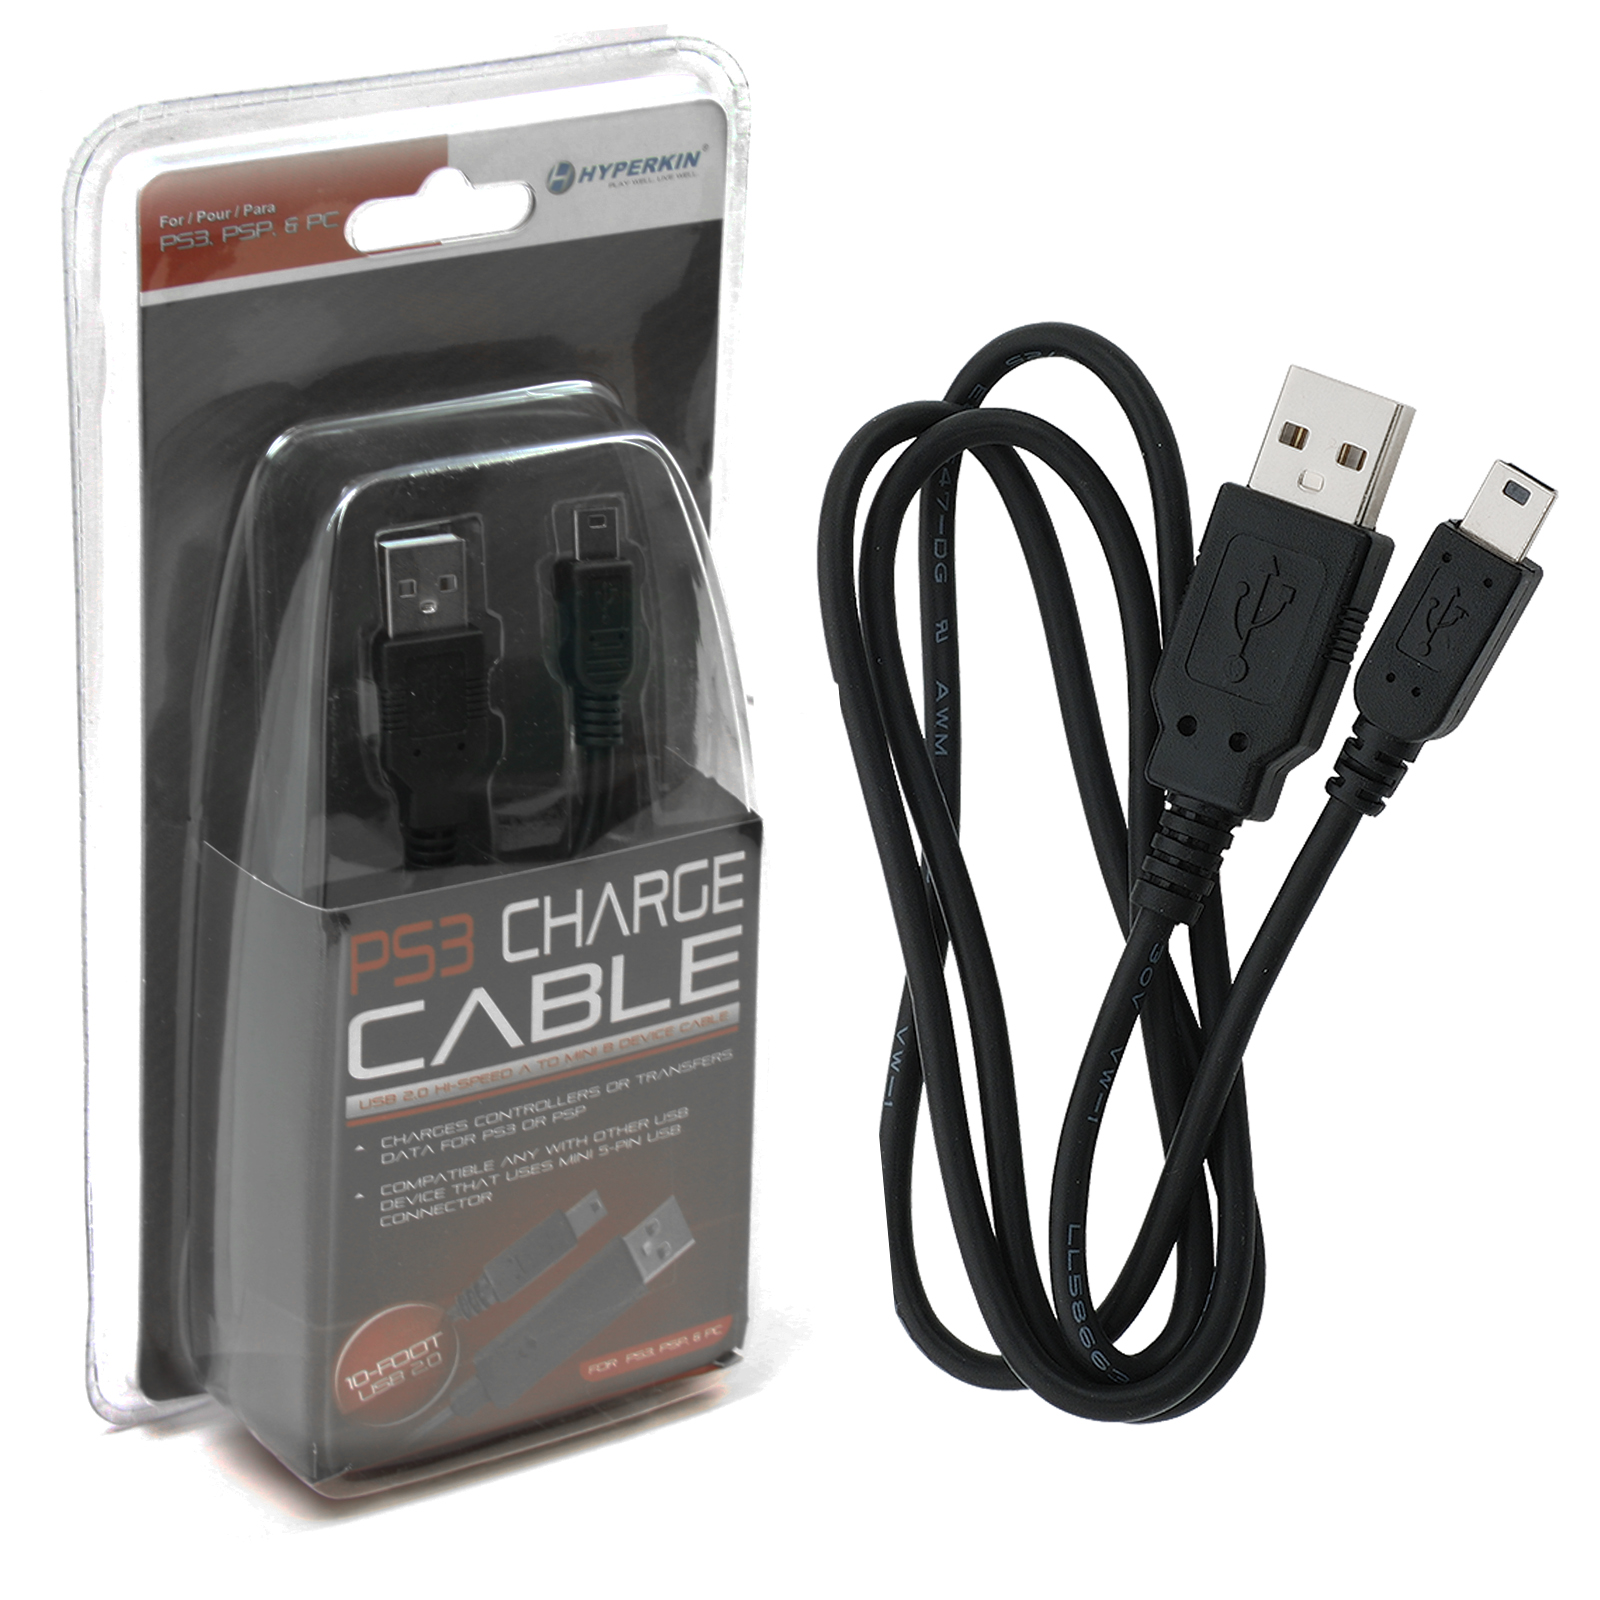 Hyperkin Mini USB Cable For Playstation 3